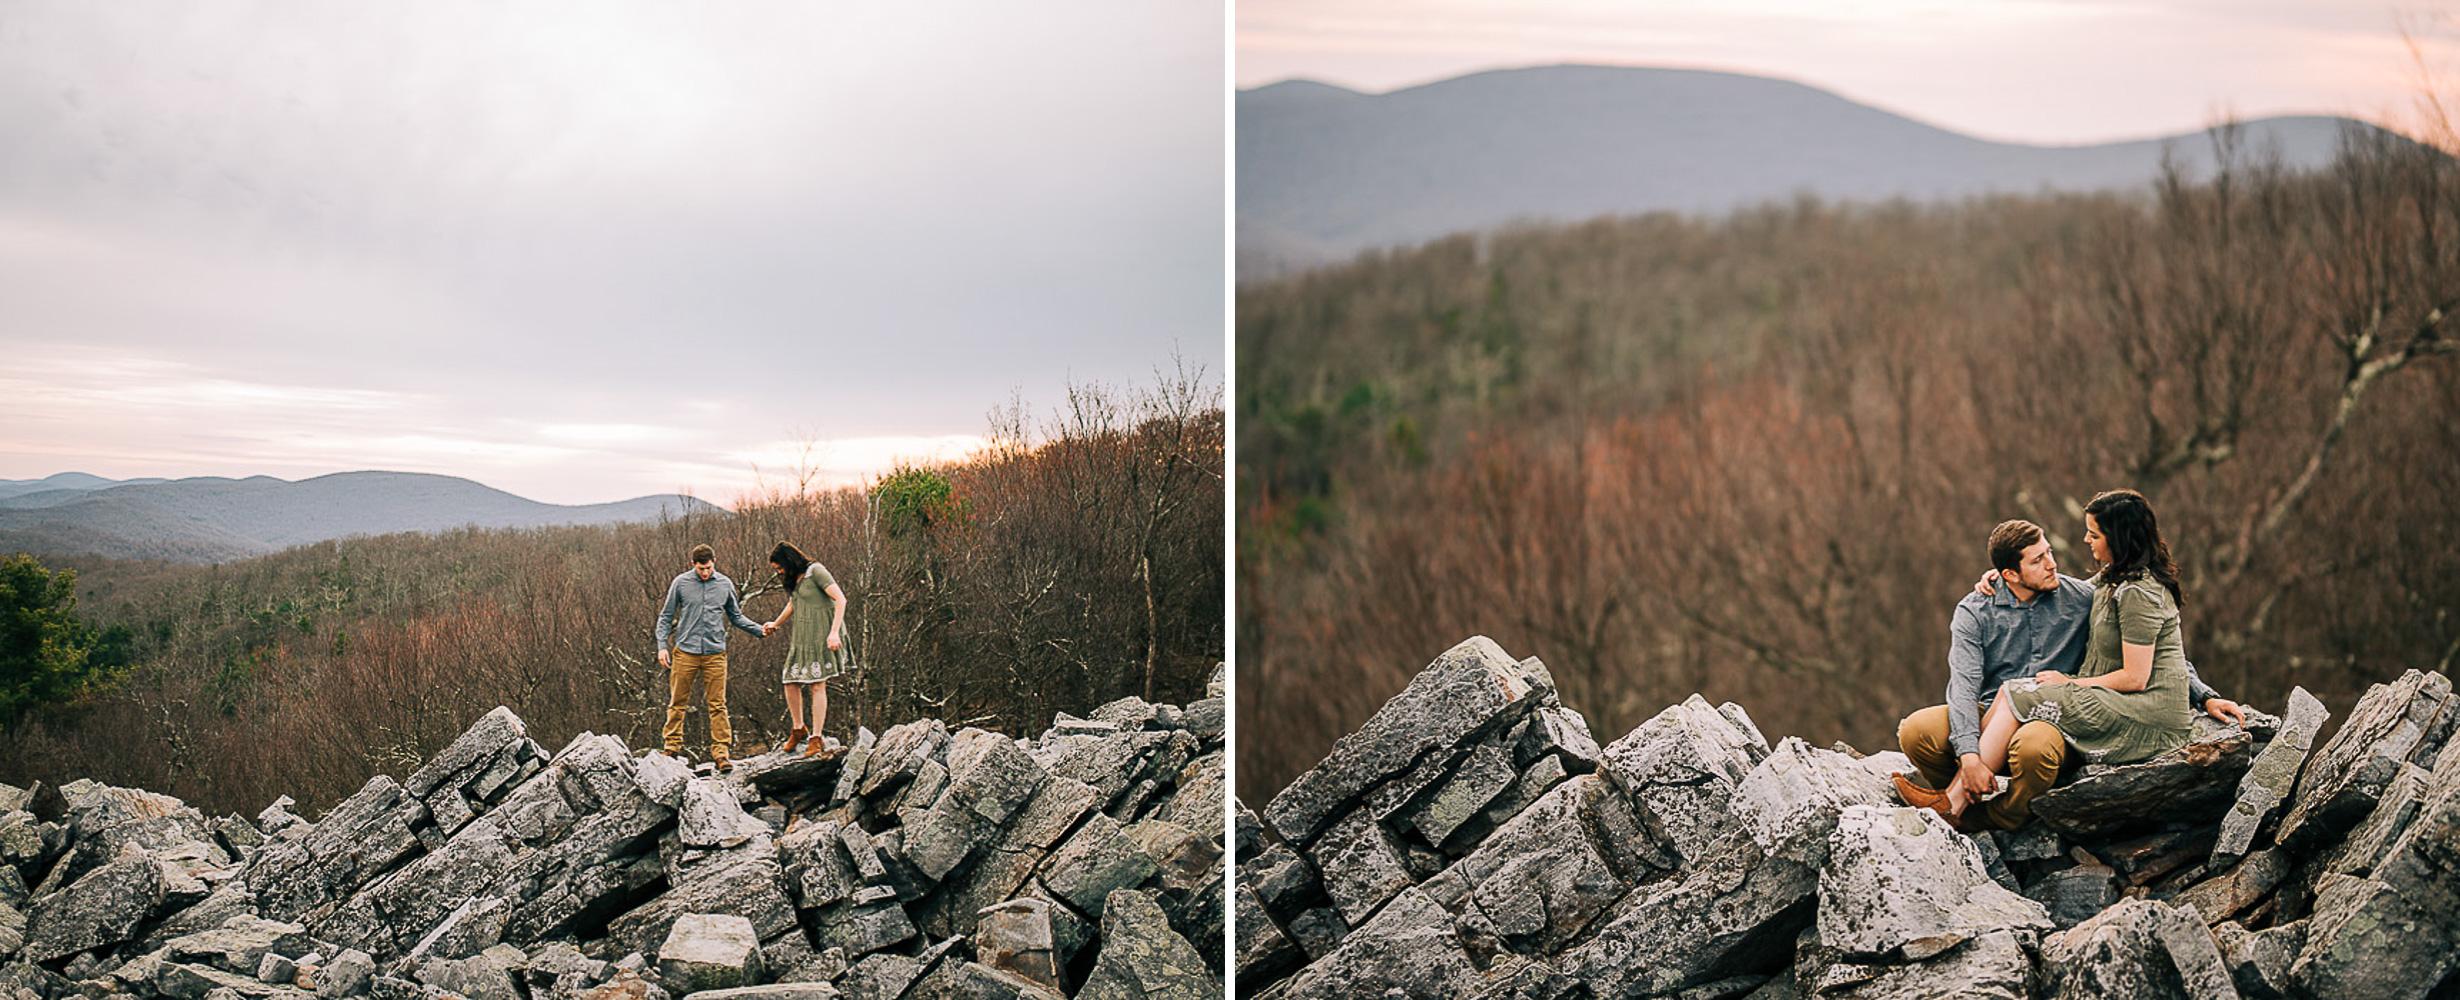 Sunrise Portriats, Mountain Portraits, Engagement Portraits, Anniversary Portraits, Summer Mast Photography 09.jpg